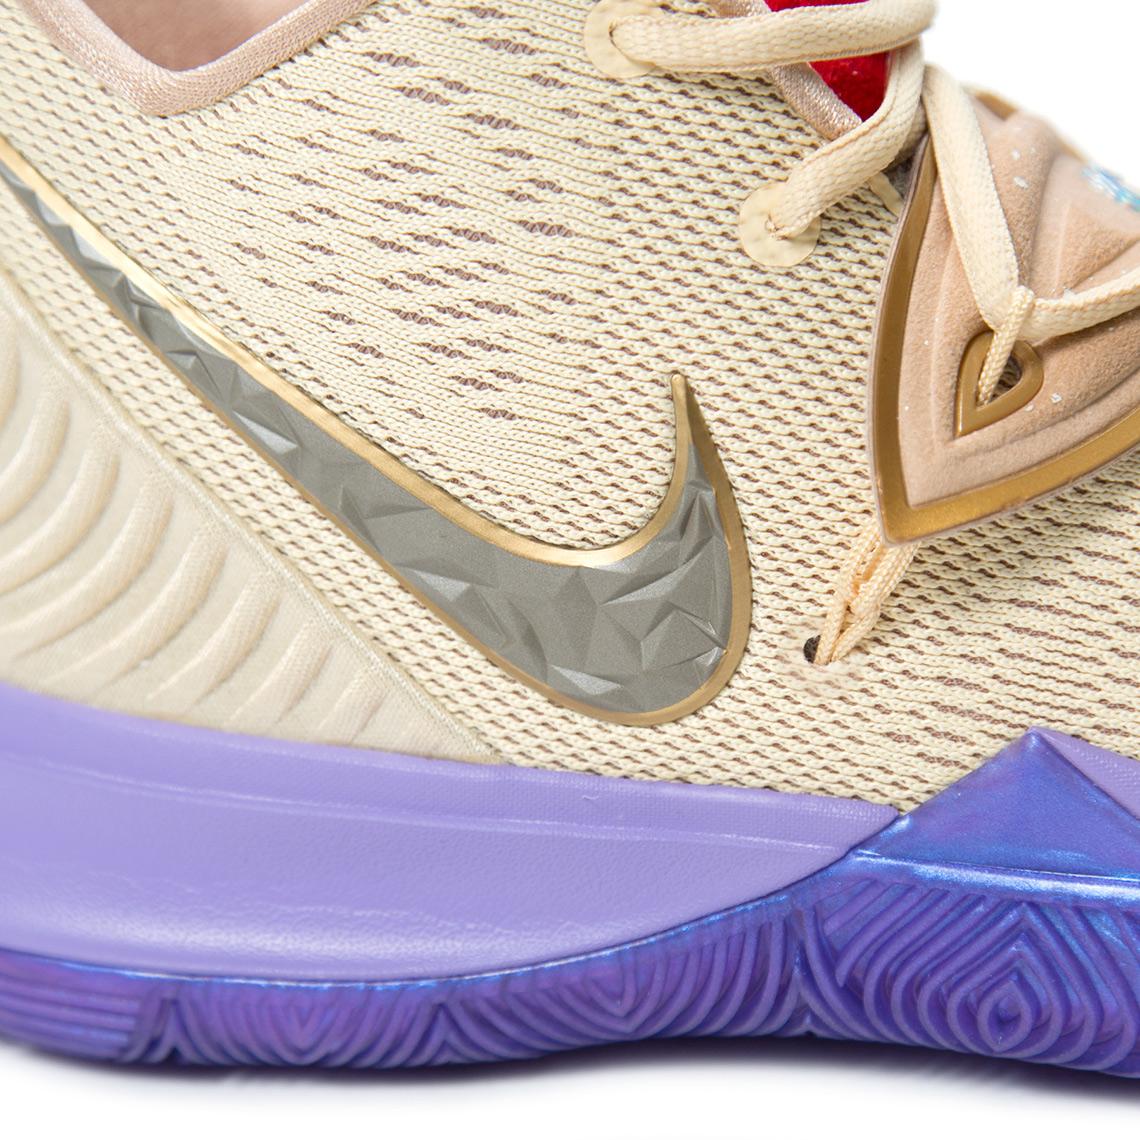 Concepts Nike Kyrie 5 Ikhet